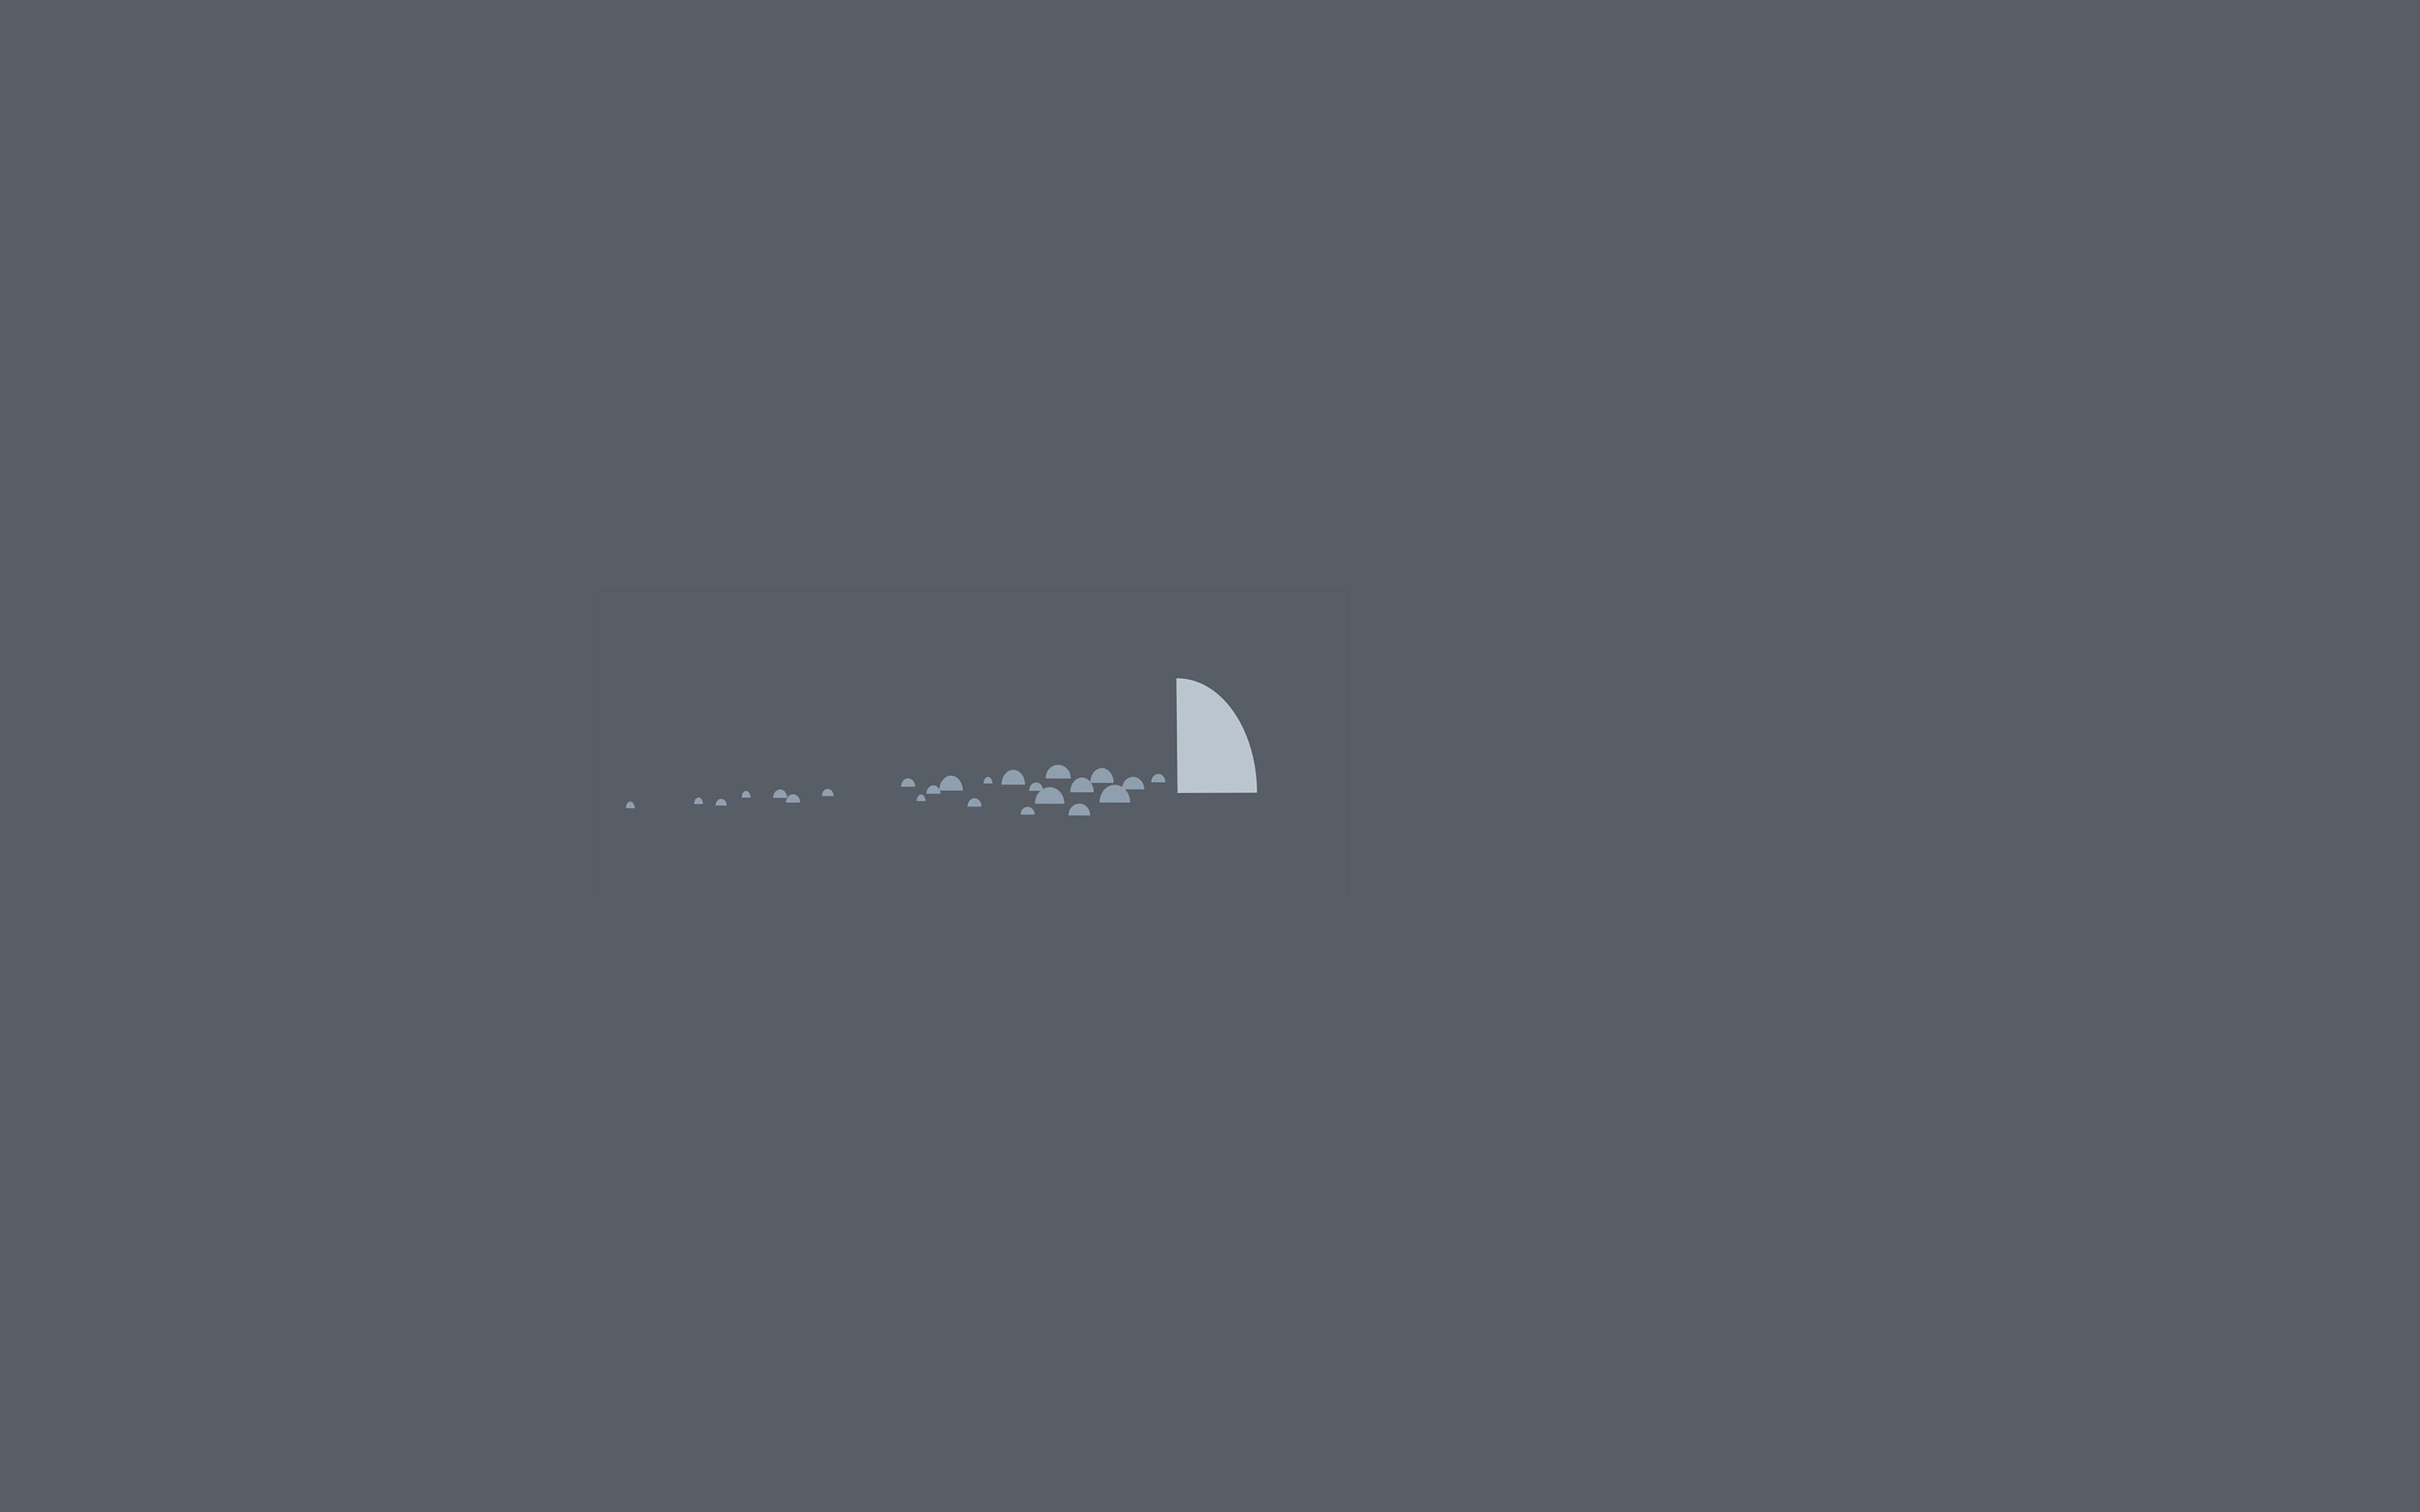 Beautiful Wallpaper Macbook Minimalist - papers  Pic_315599.jpg